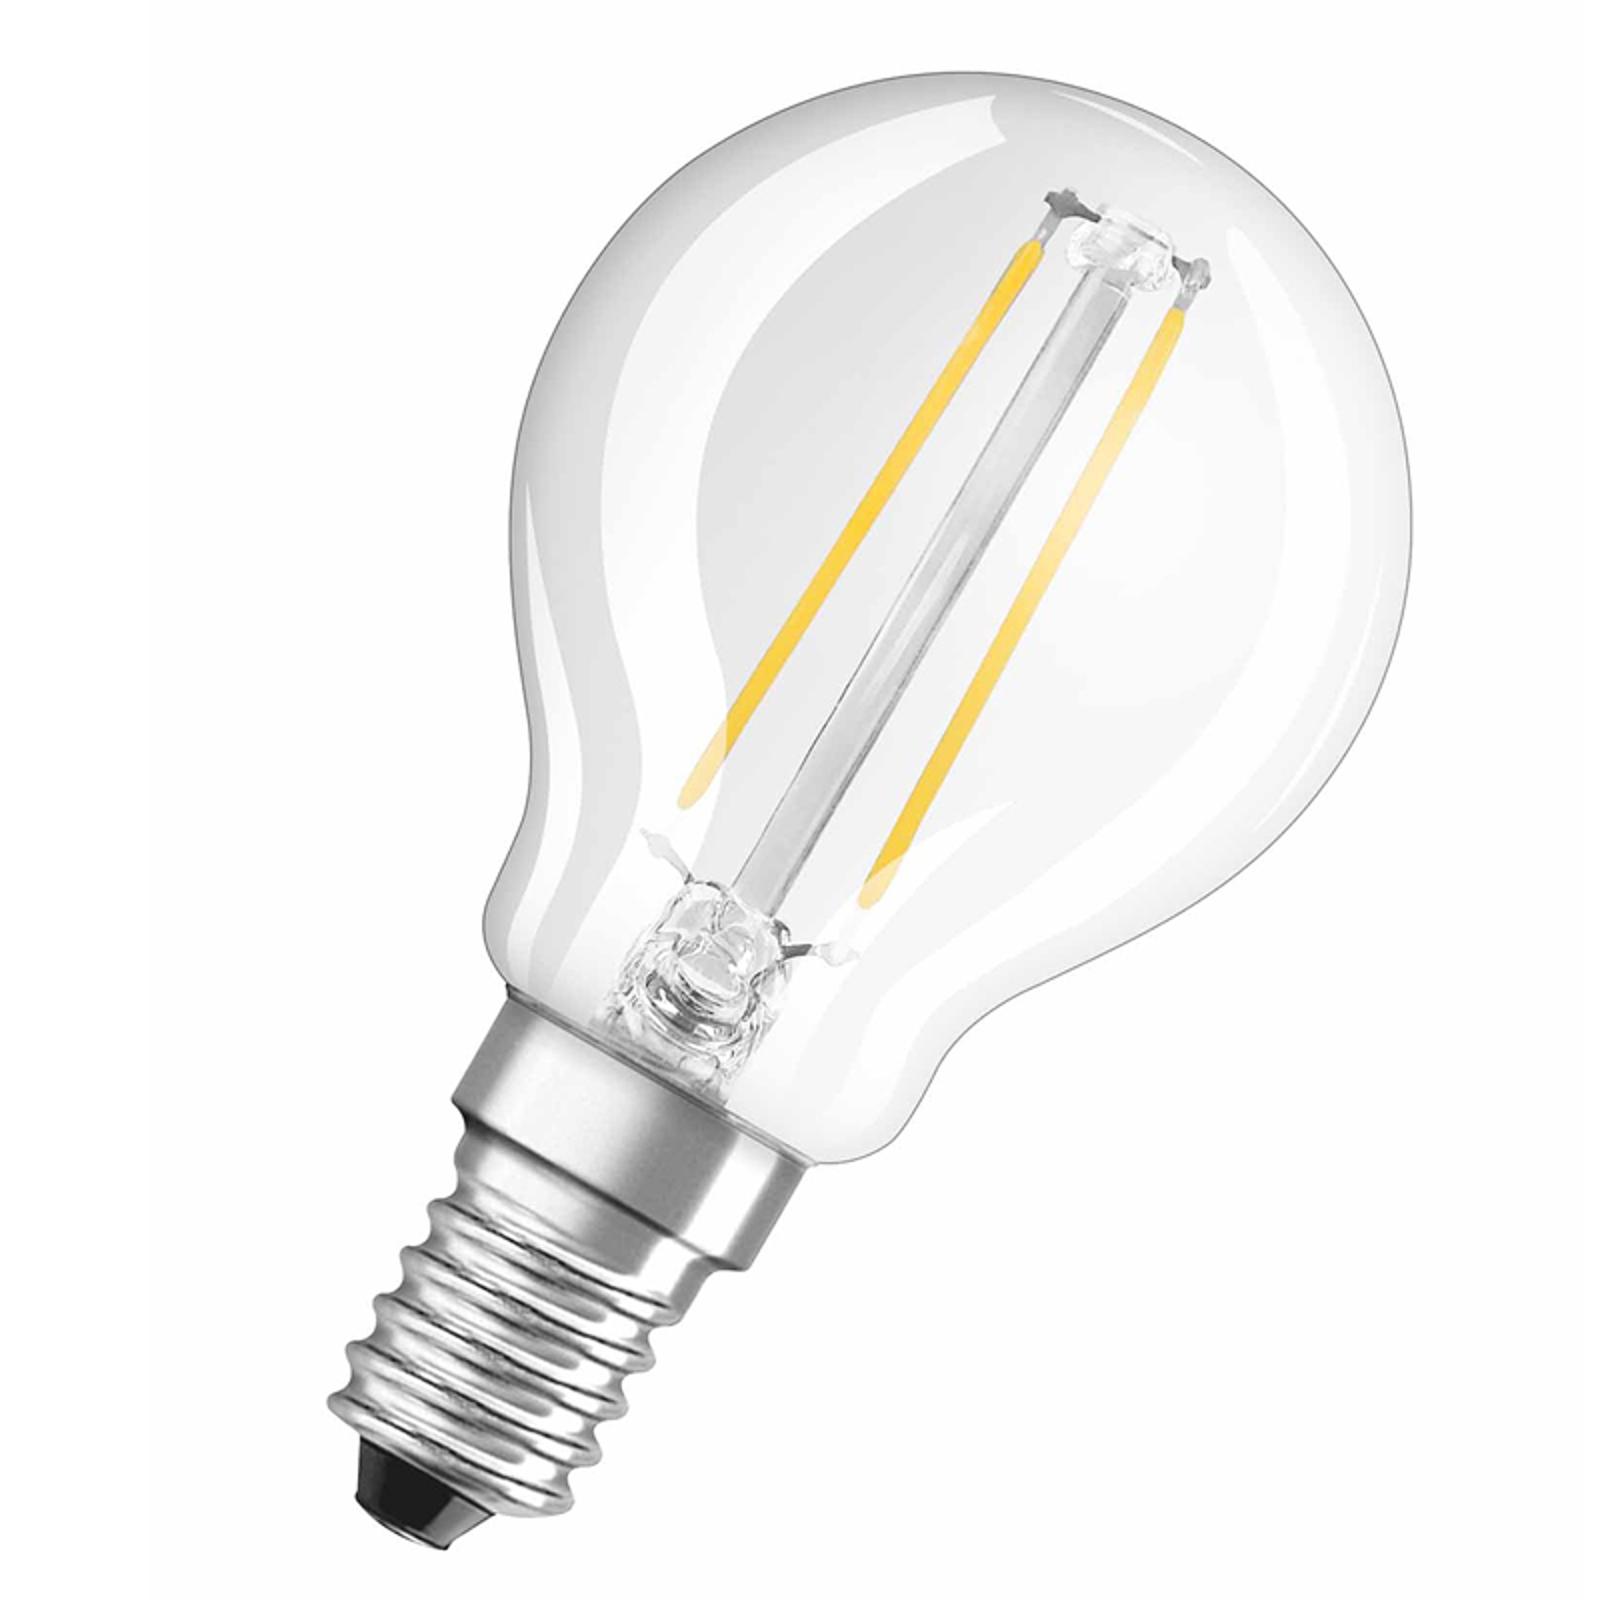 OSRAM LED-Lampe E14 Tropfen 2,5W 827 Retrofit klar